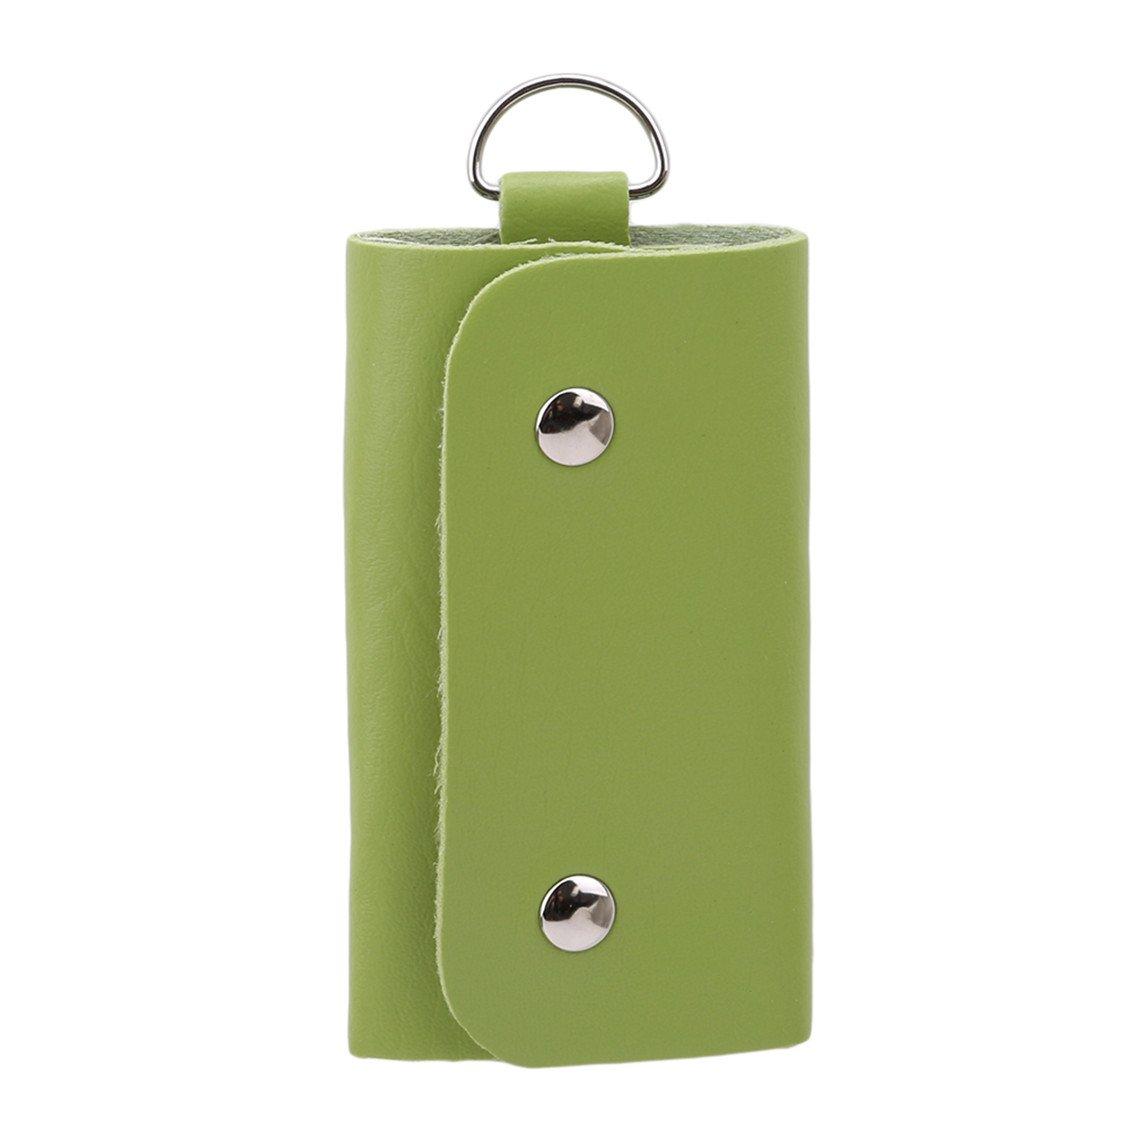 Rurah Leather Key Case Wallet Mens Womens Key Case Car Key Holder Bag Wallet,green